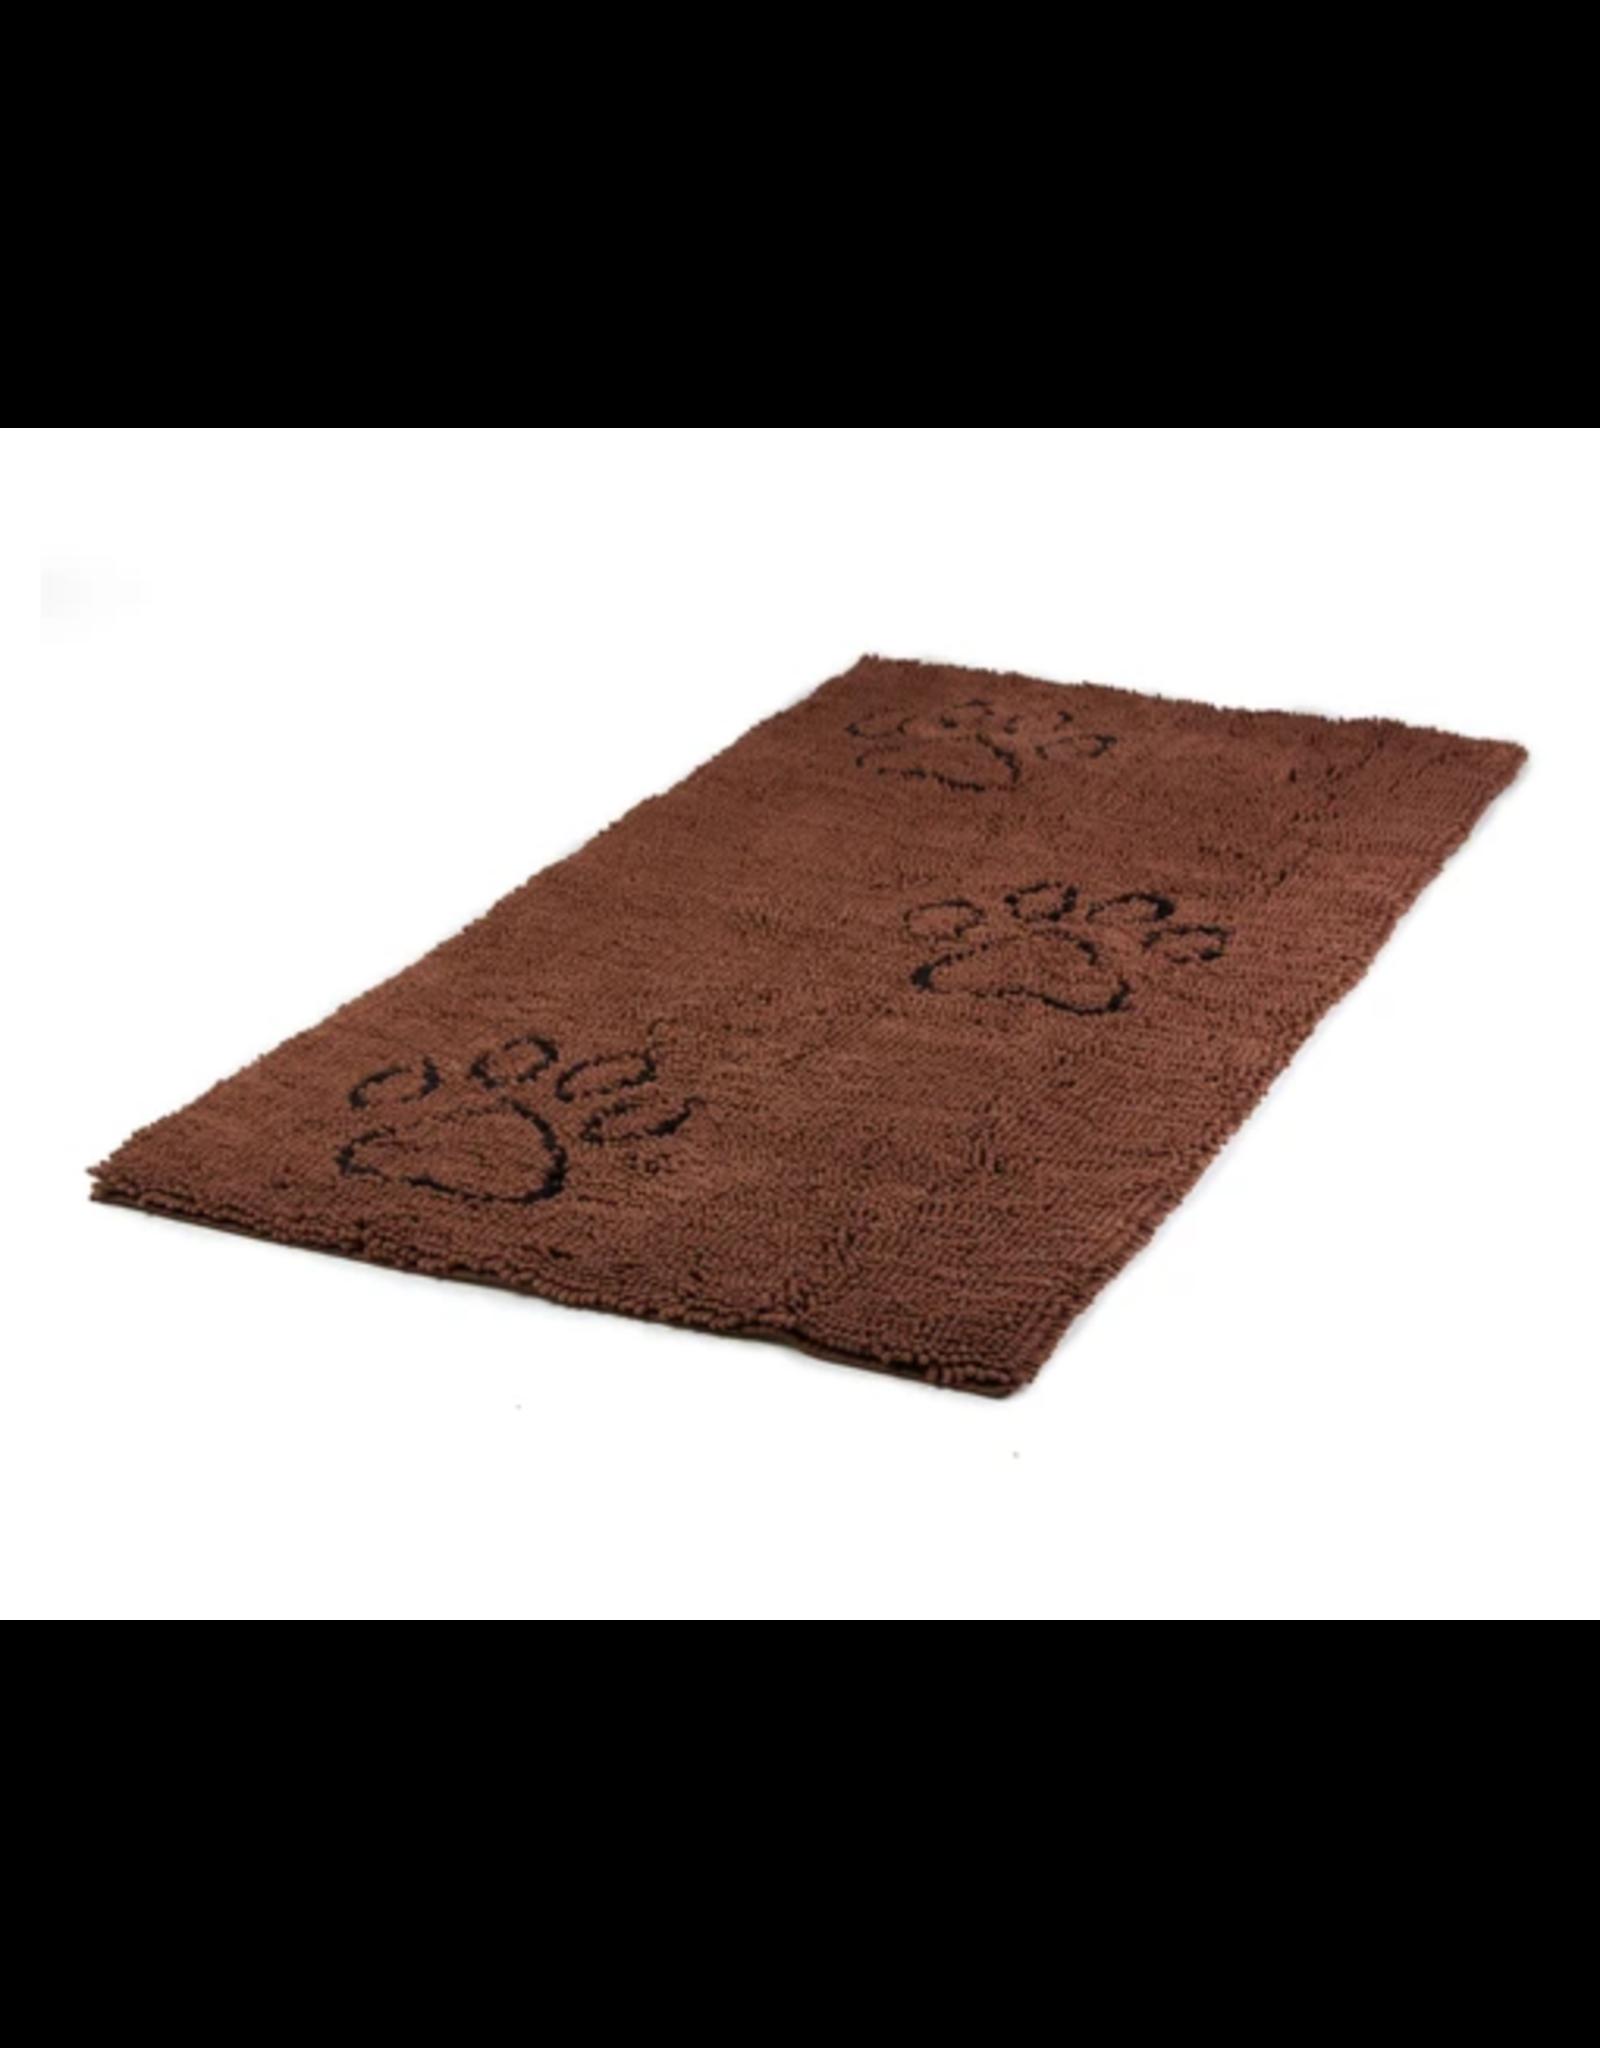 Dog Gone Smart Dirty Dog Doormat Runner 60x30 - Brown